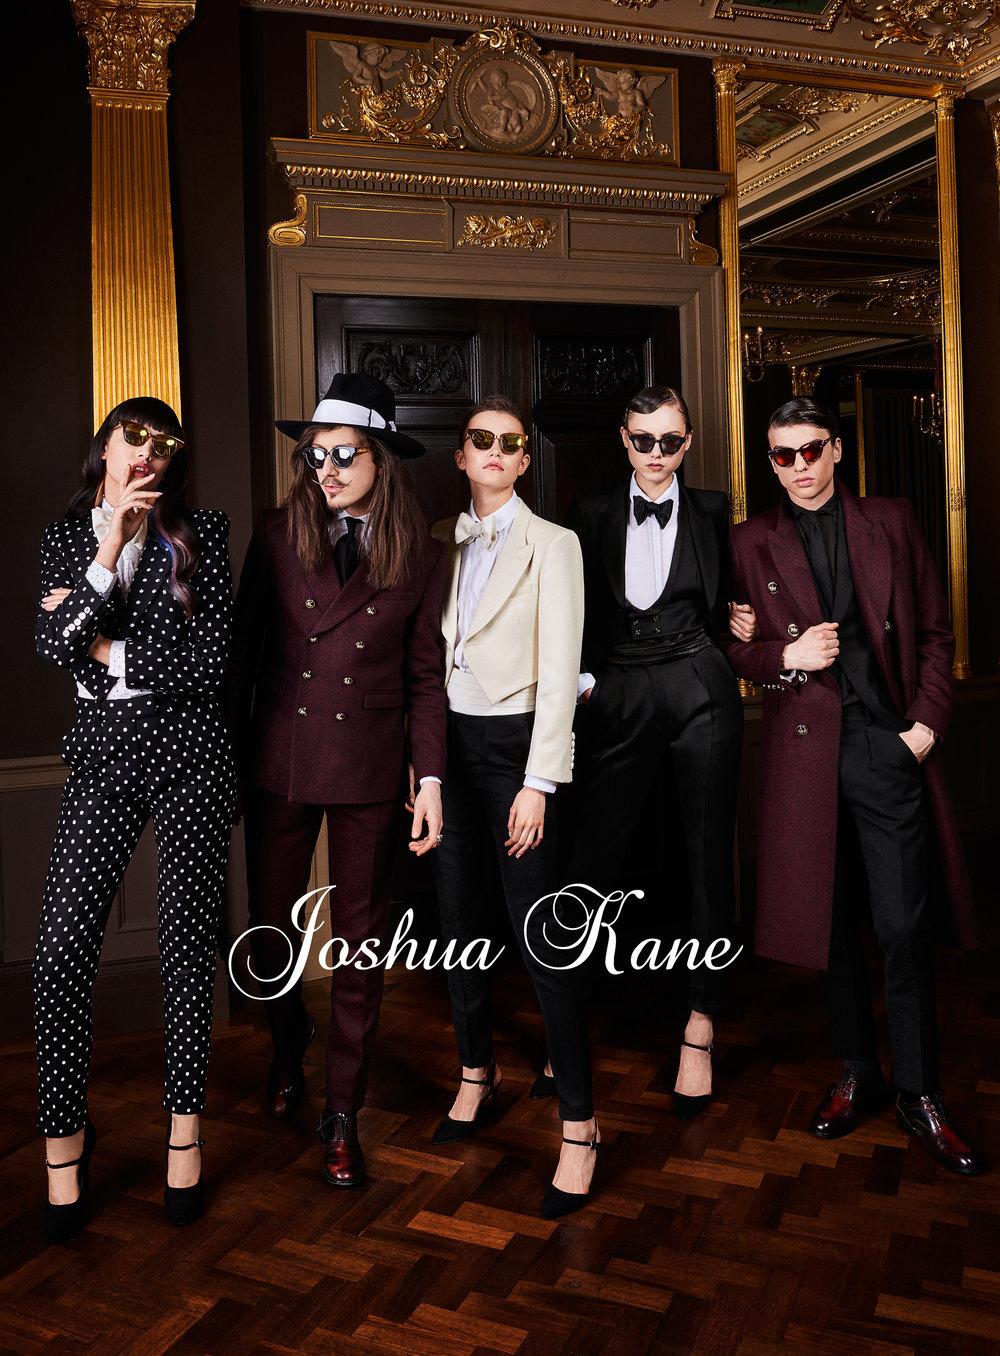 Joshua Kane Campaign SS16